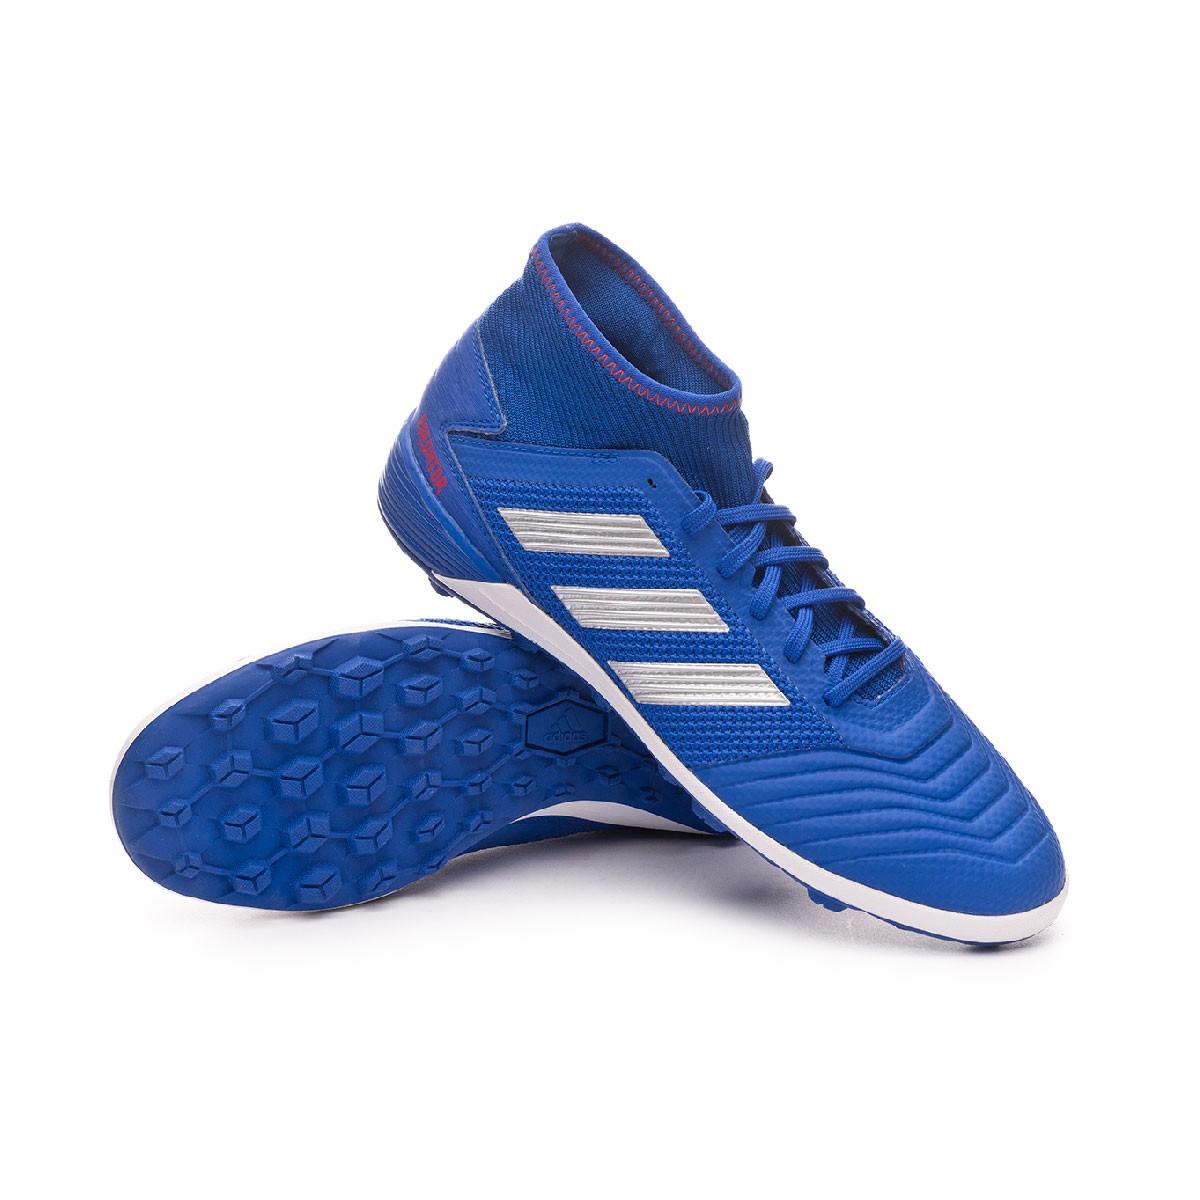 pre order factory authentic watch adidas Predator Tango 19.3 Turf Football Boot